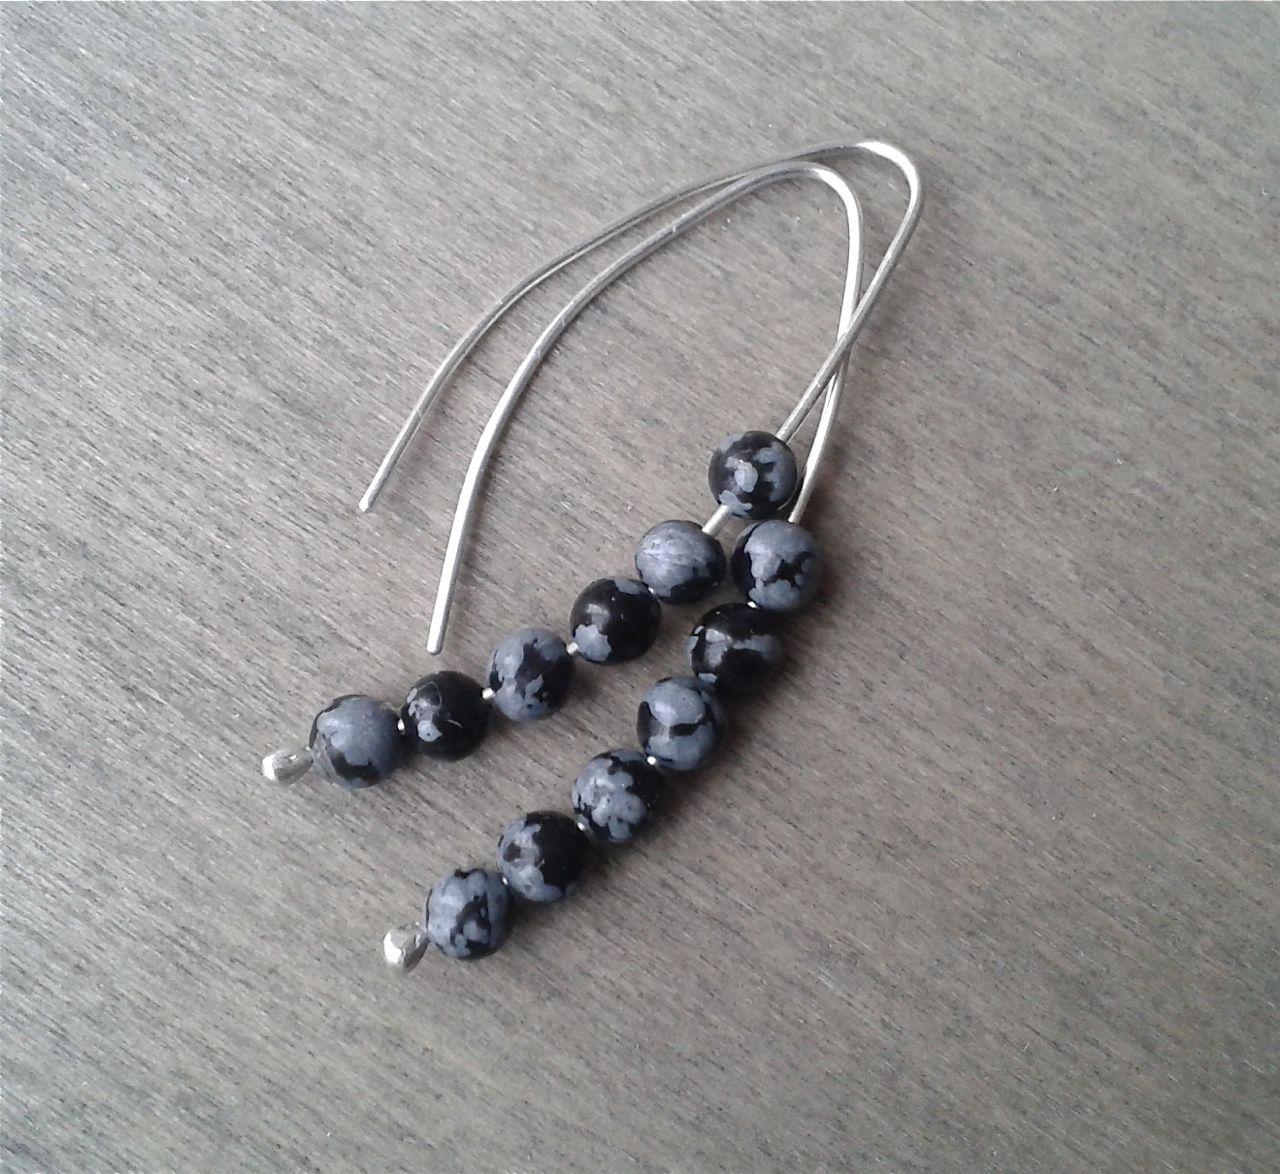 Snowflake obsidian threader earrings